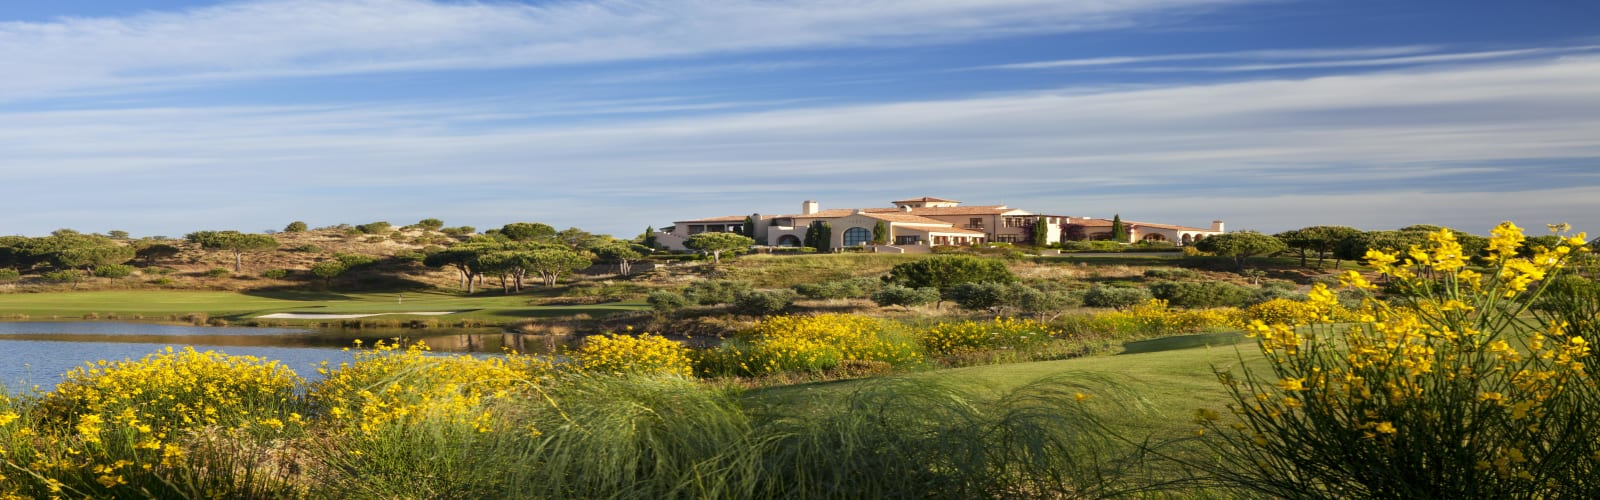 Travel Tips For The Algarve